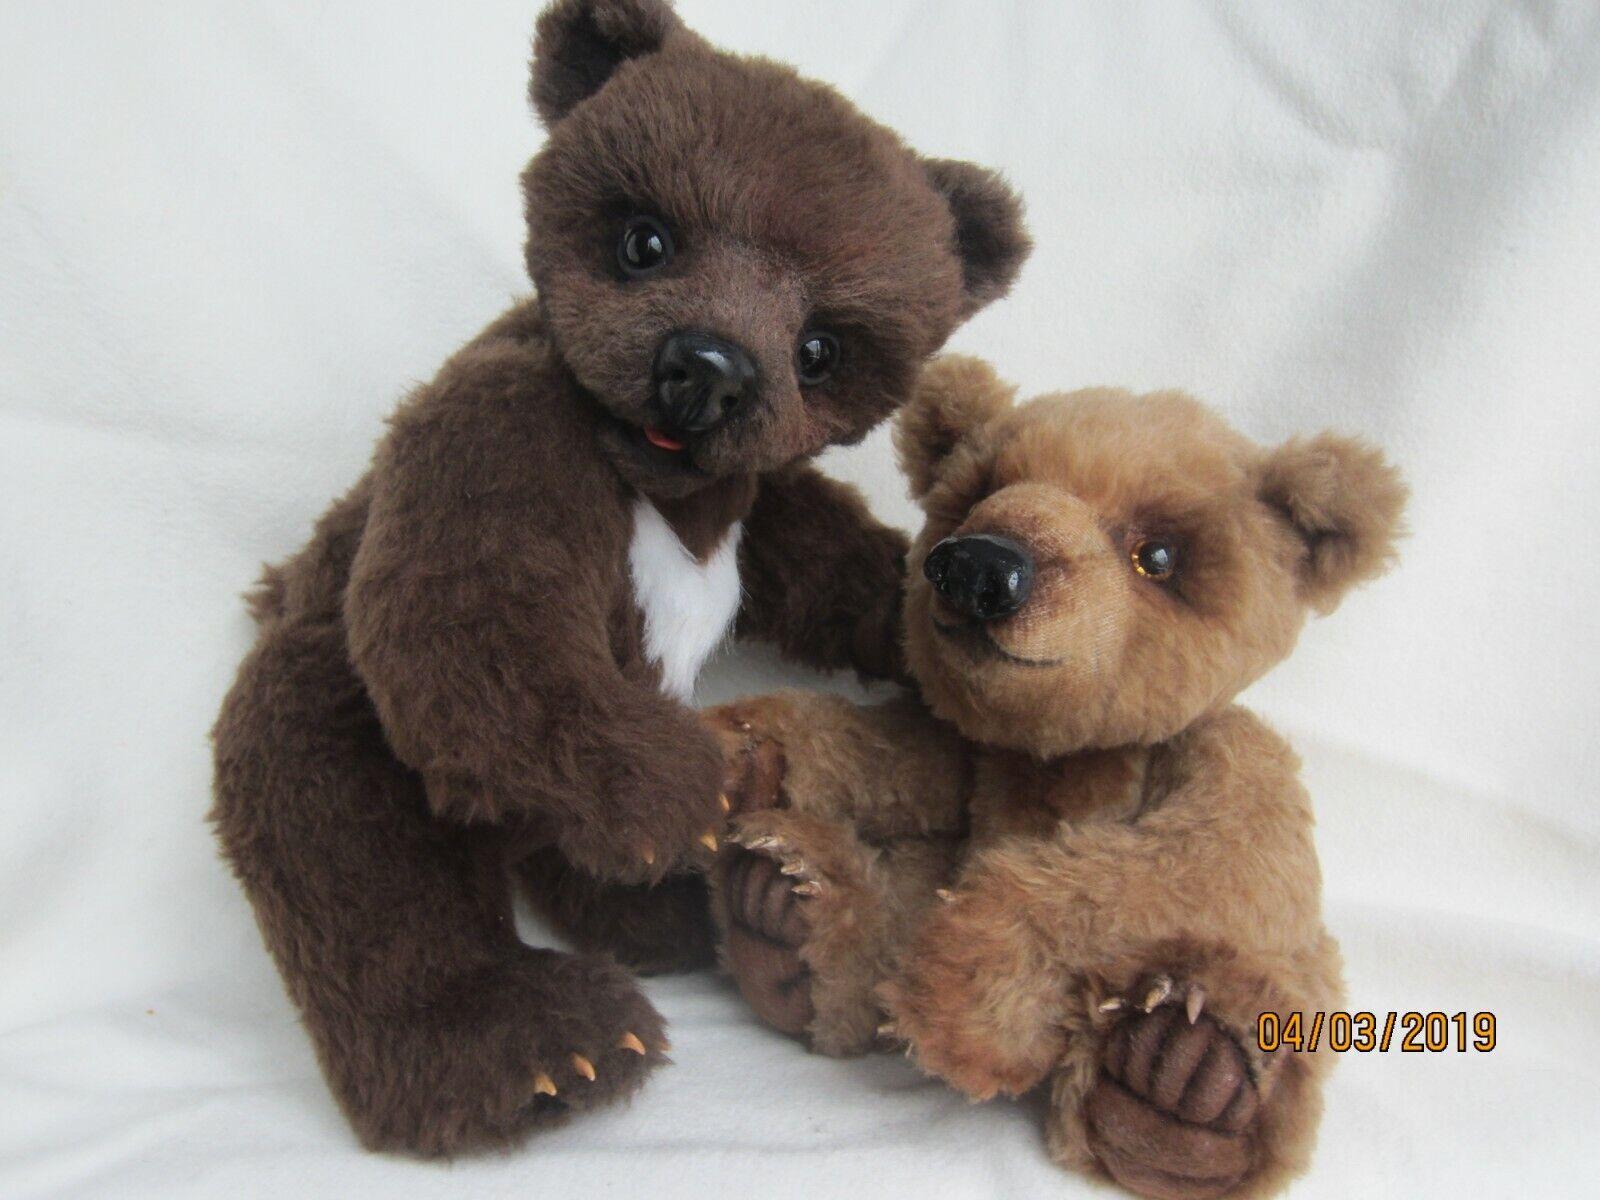 Teddybär neu handgemacht Unikat einzigartig braun weiß